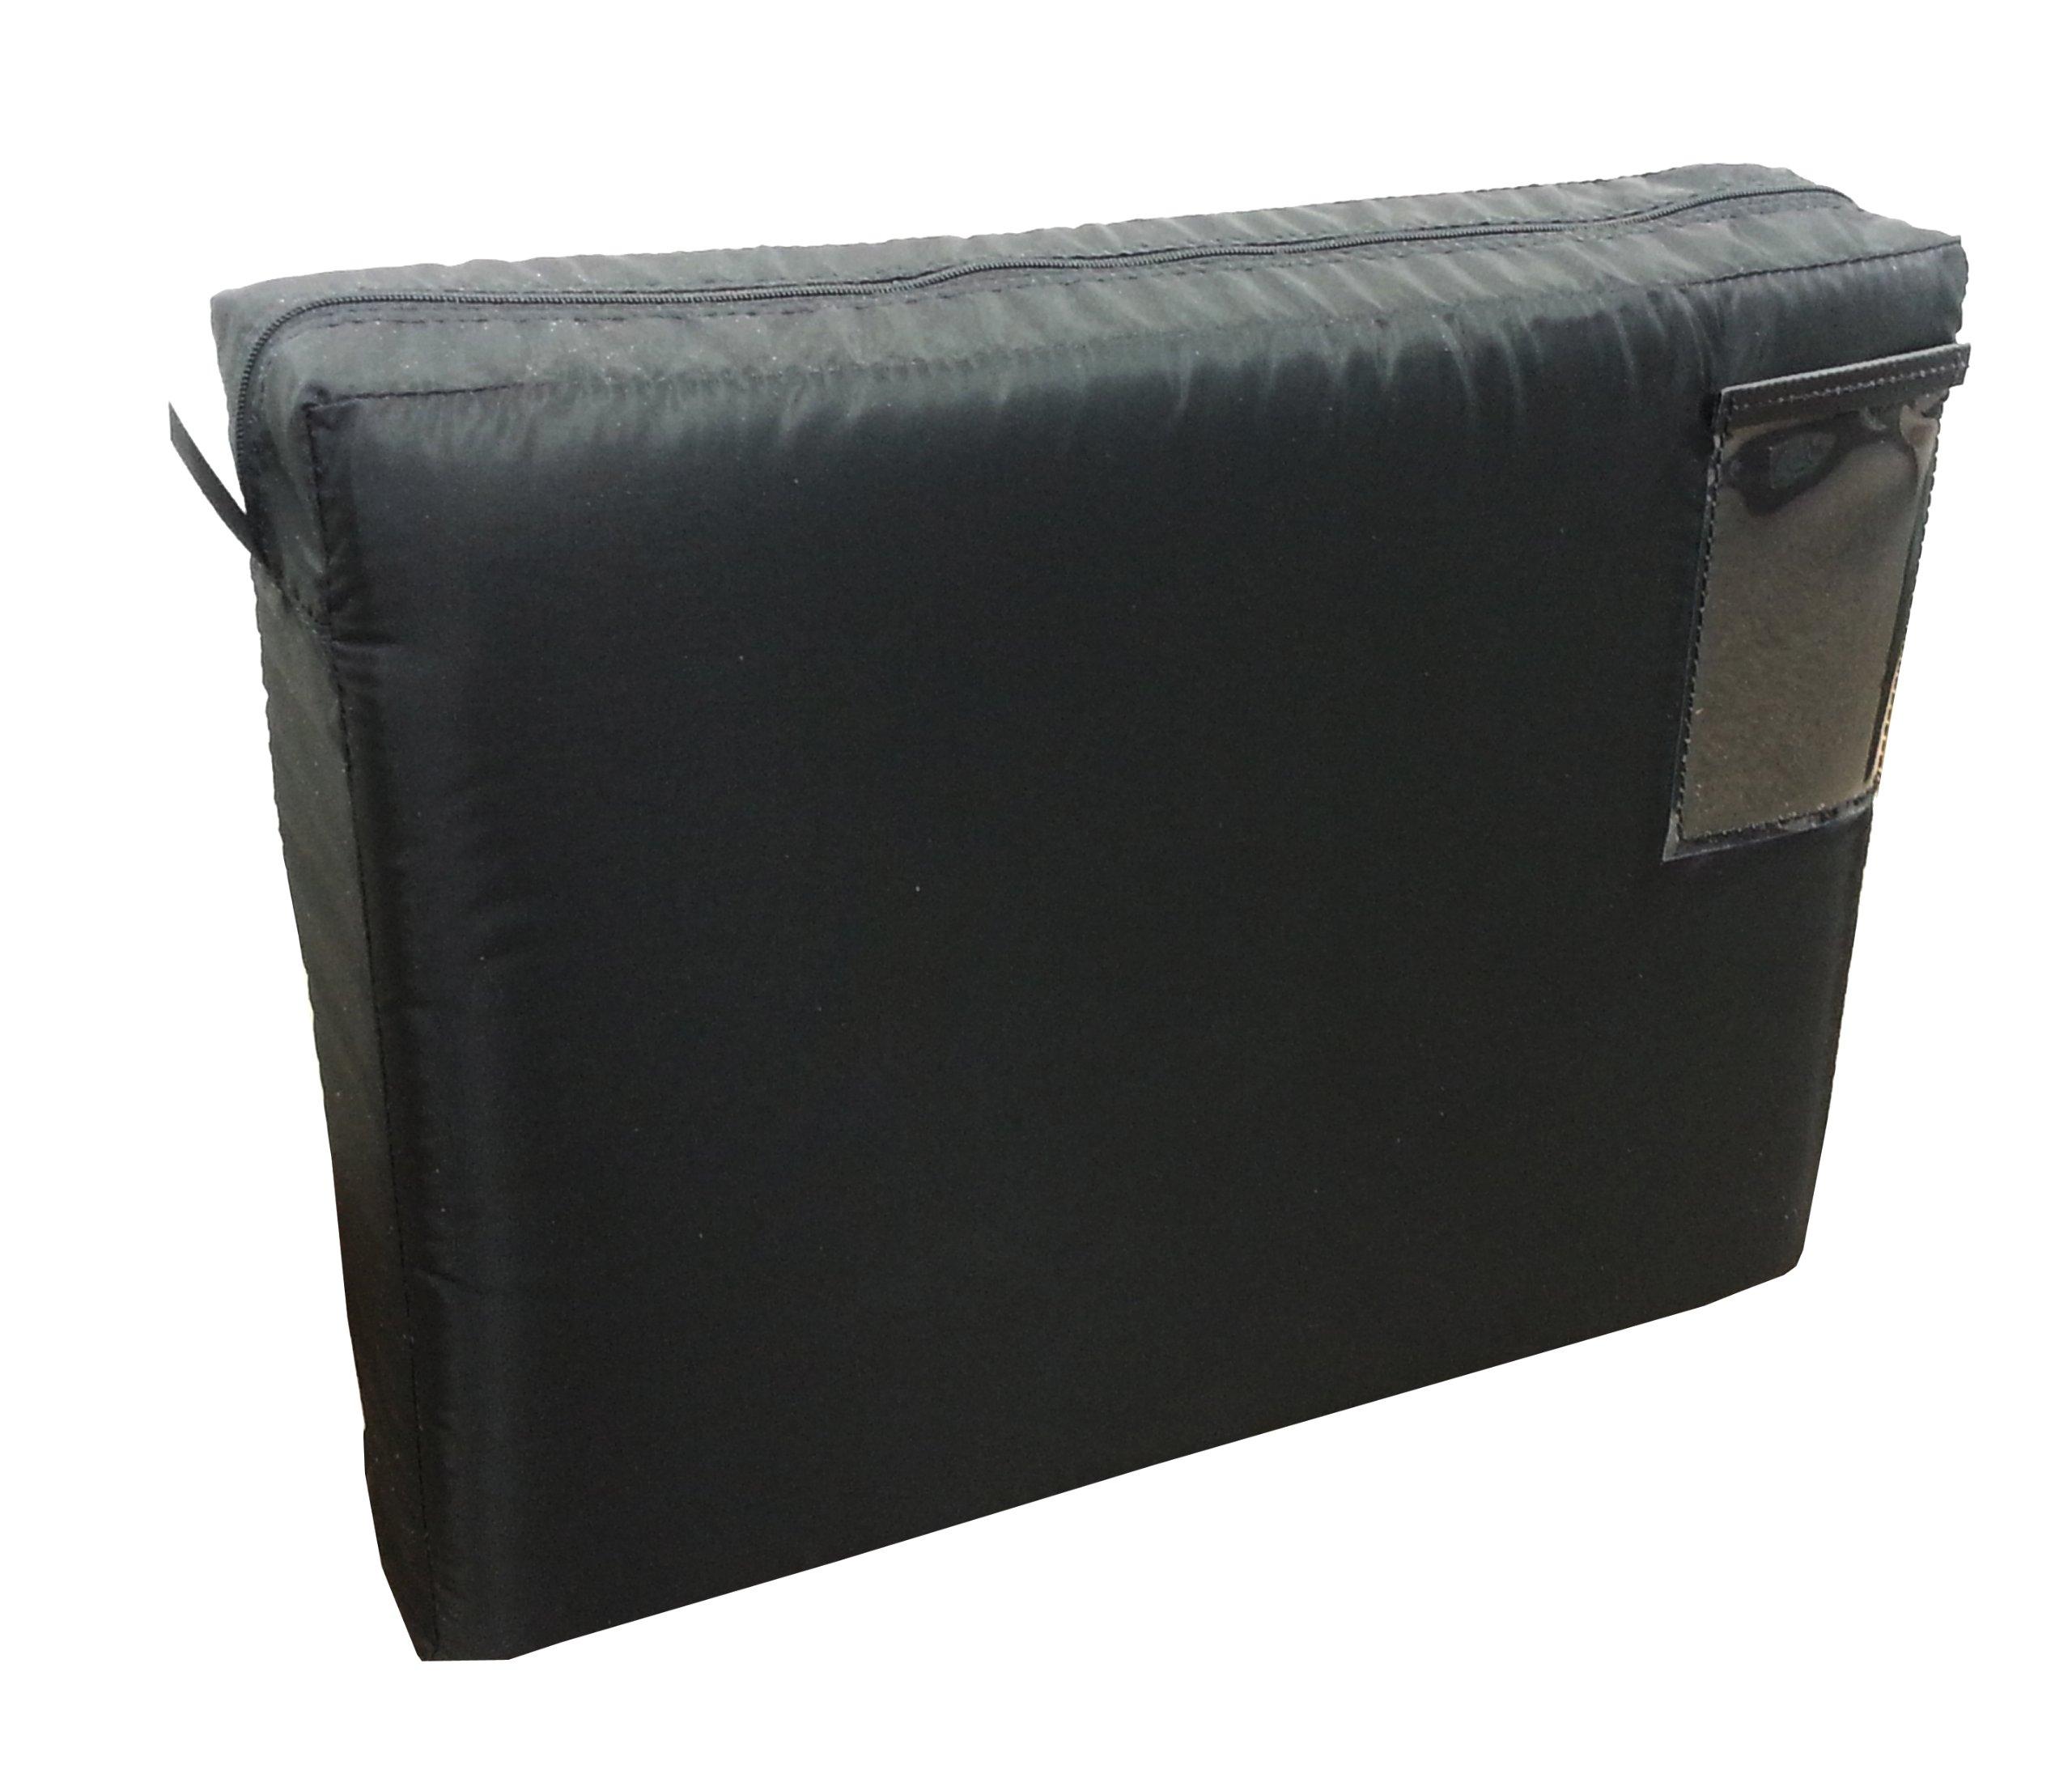 Mailer Transit Sack Expandable Interoffice Mailbag 18w x 14h x 4d Black